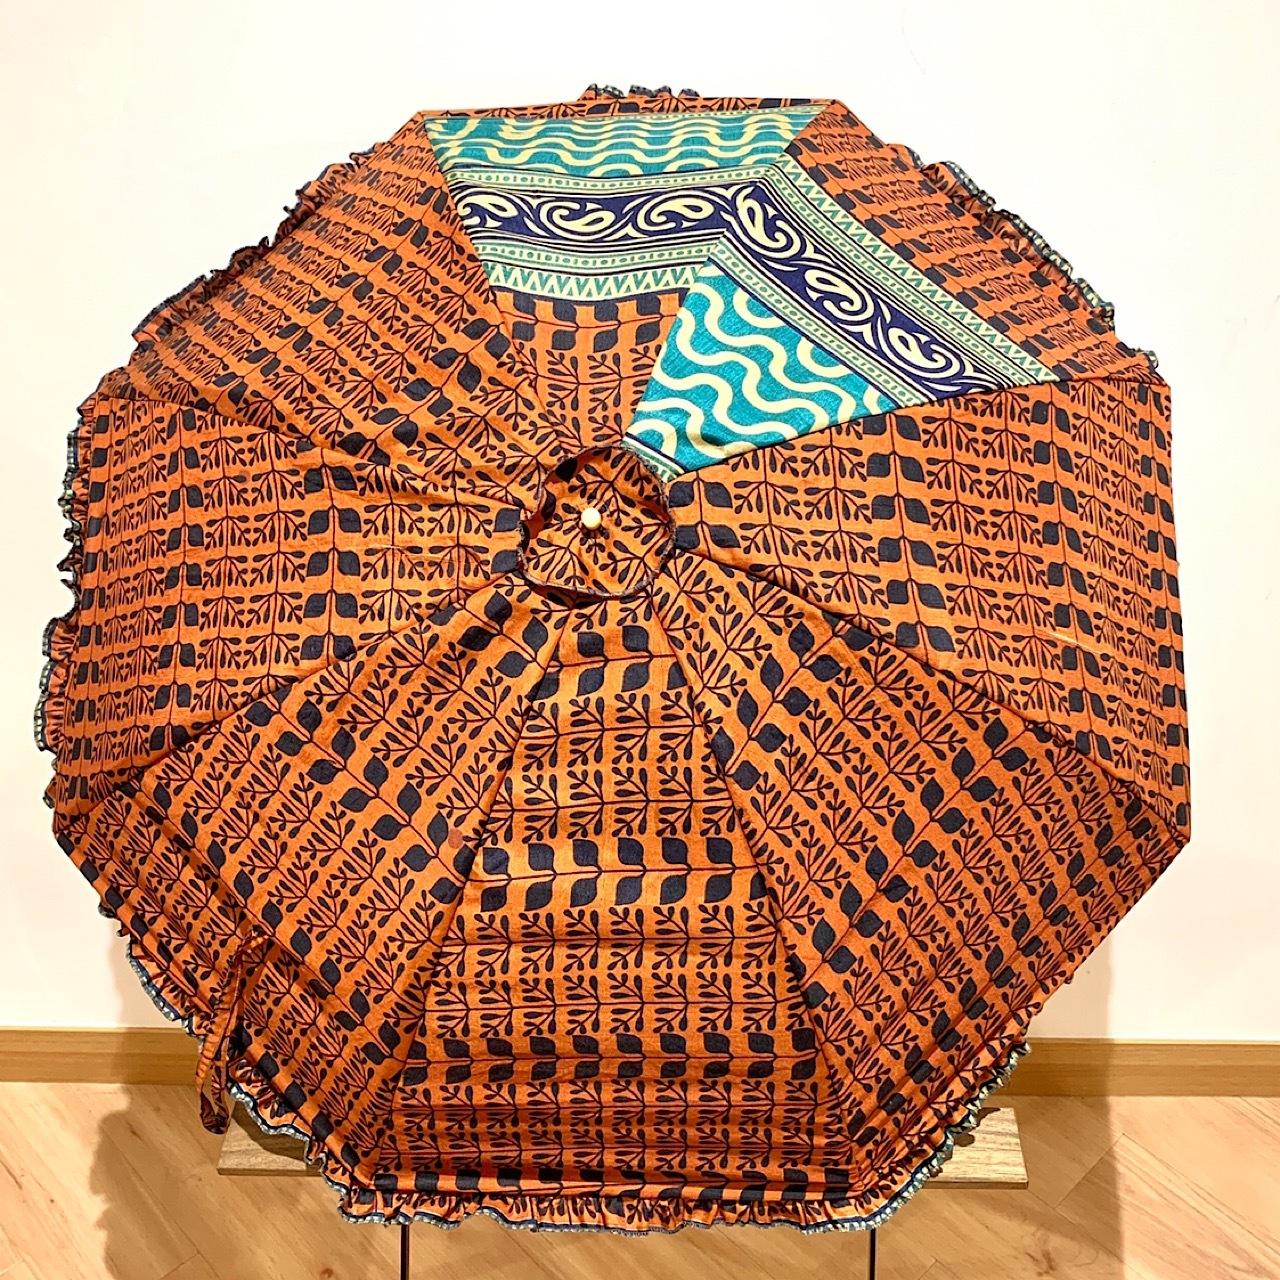 saripn-012 シルクサリー パラソルカバー 折畳傘本体・共布バッグ付き